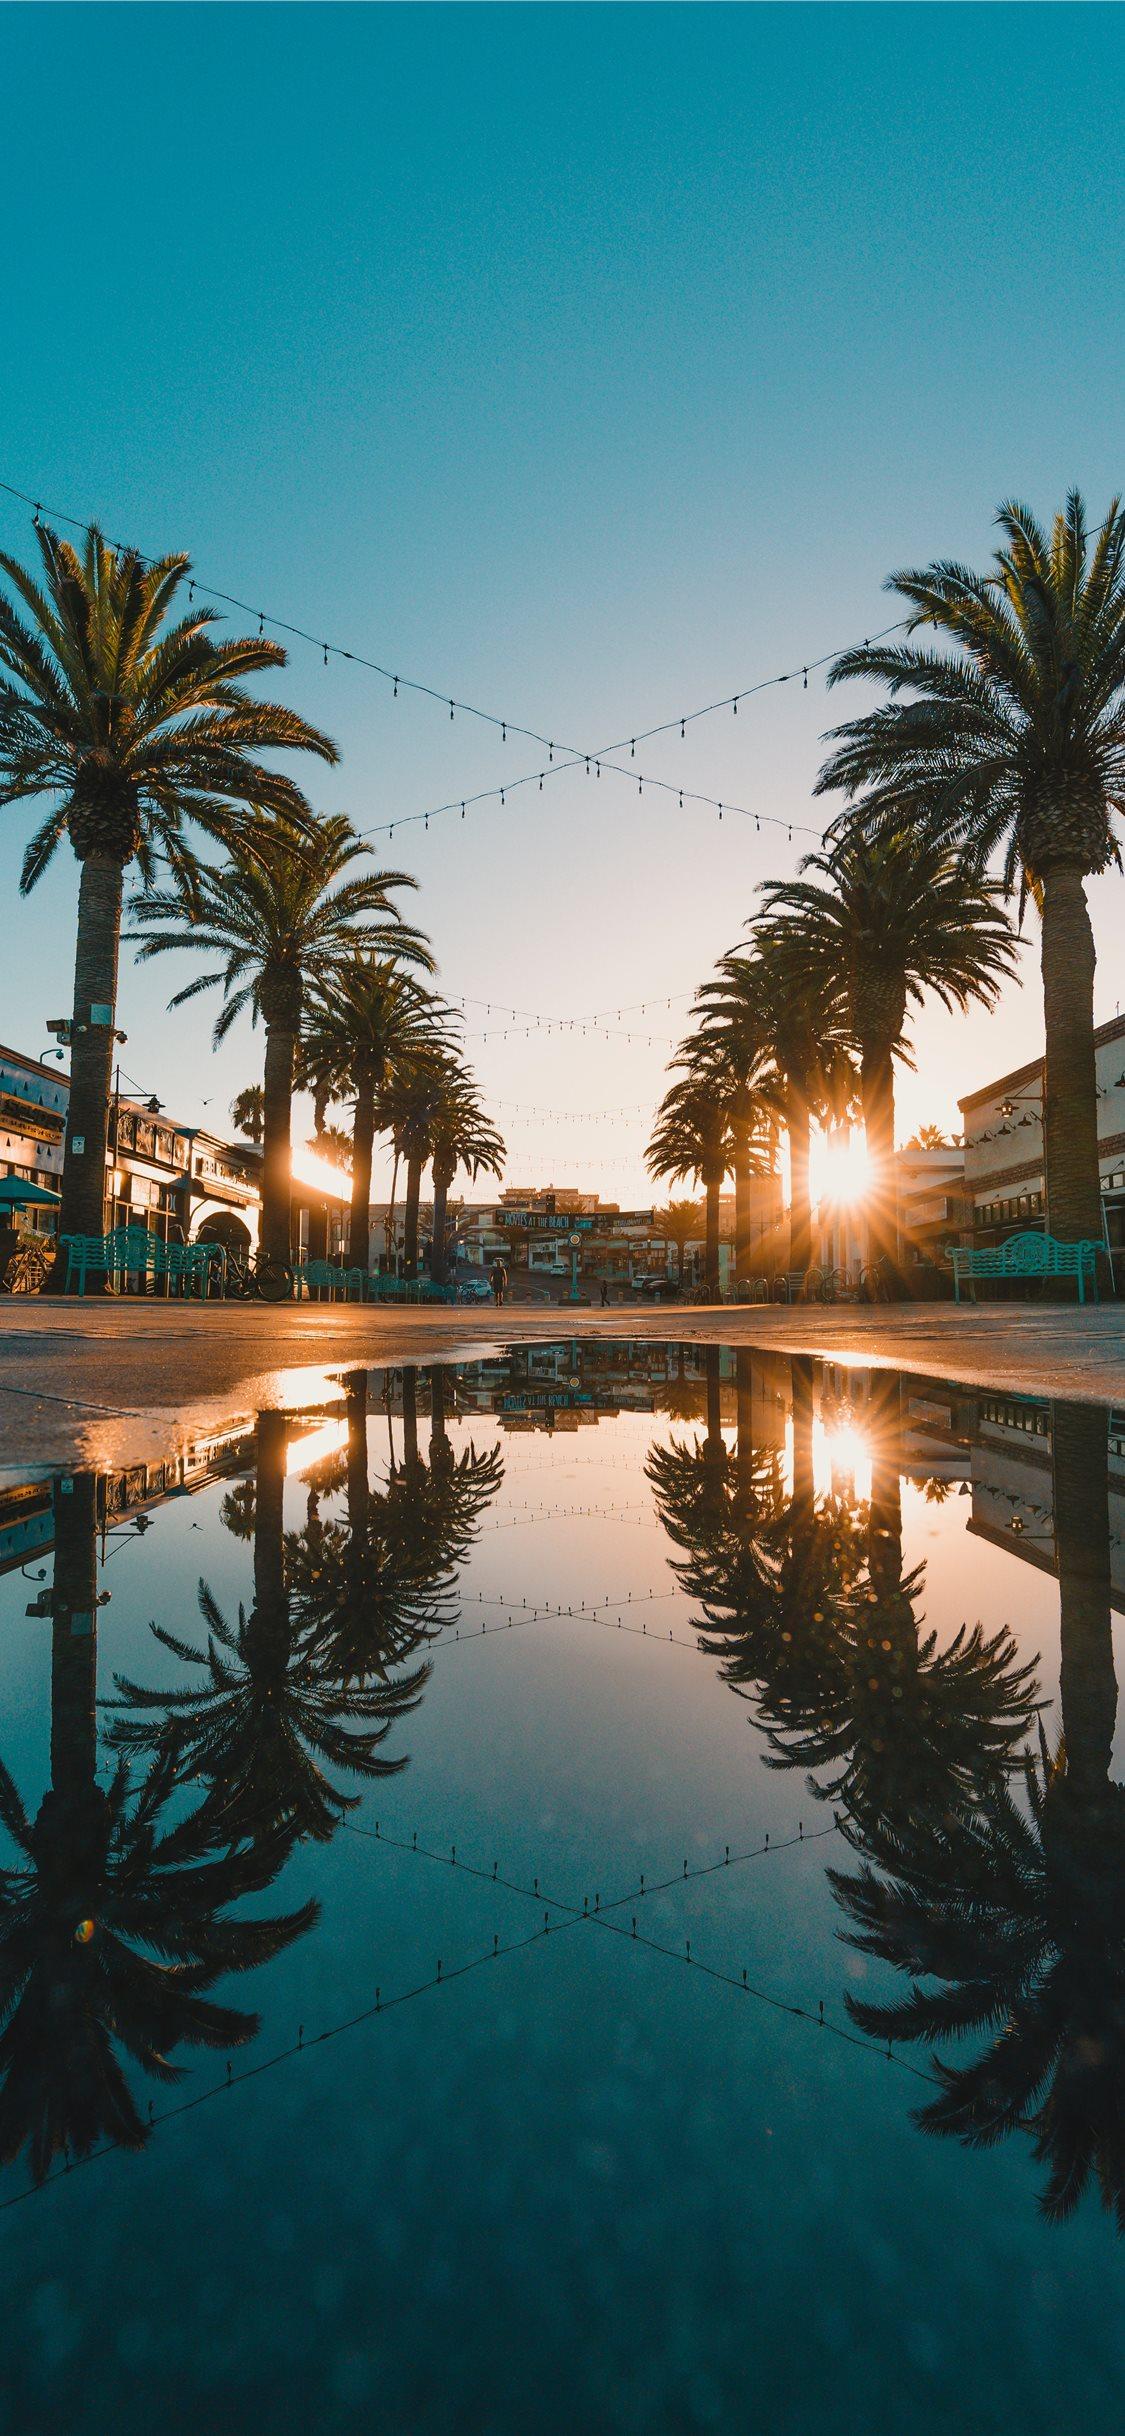 Palm Tree Sunset Iphone 11 Wallpaper